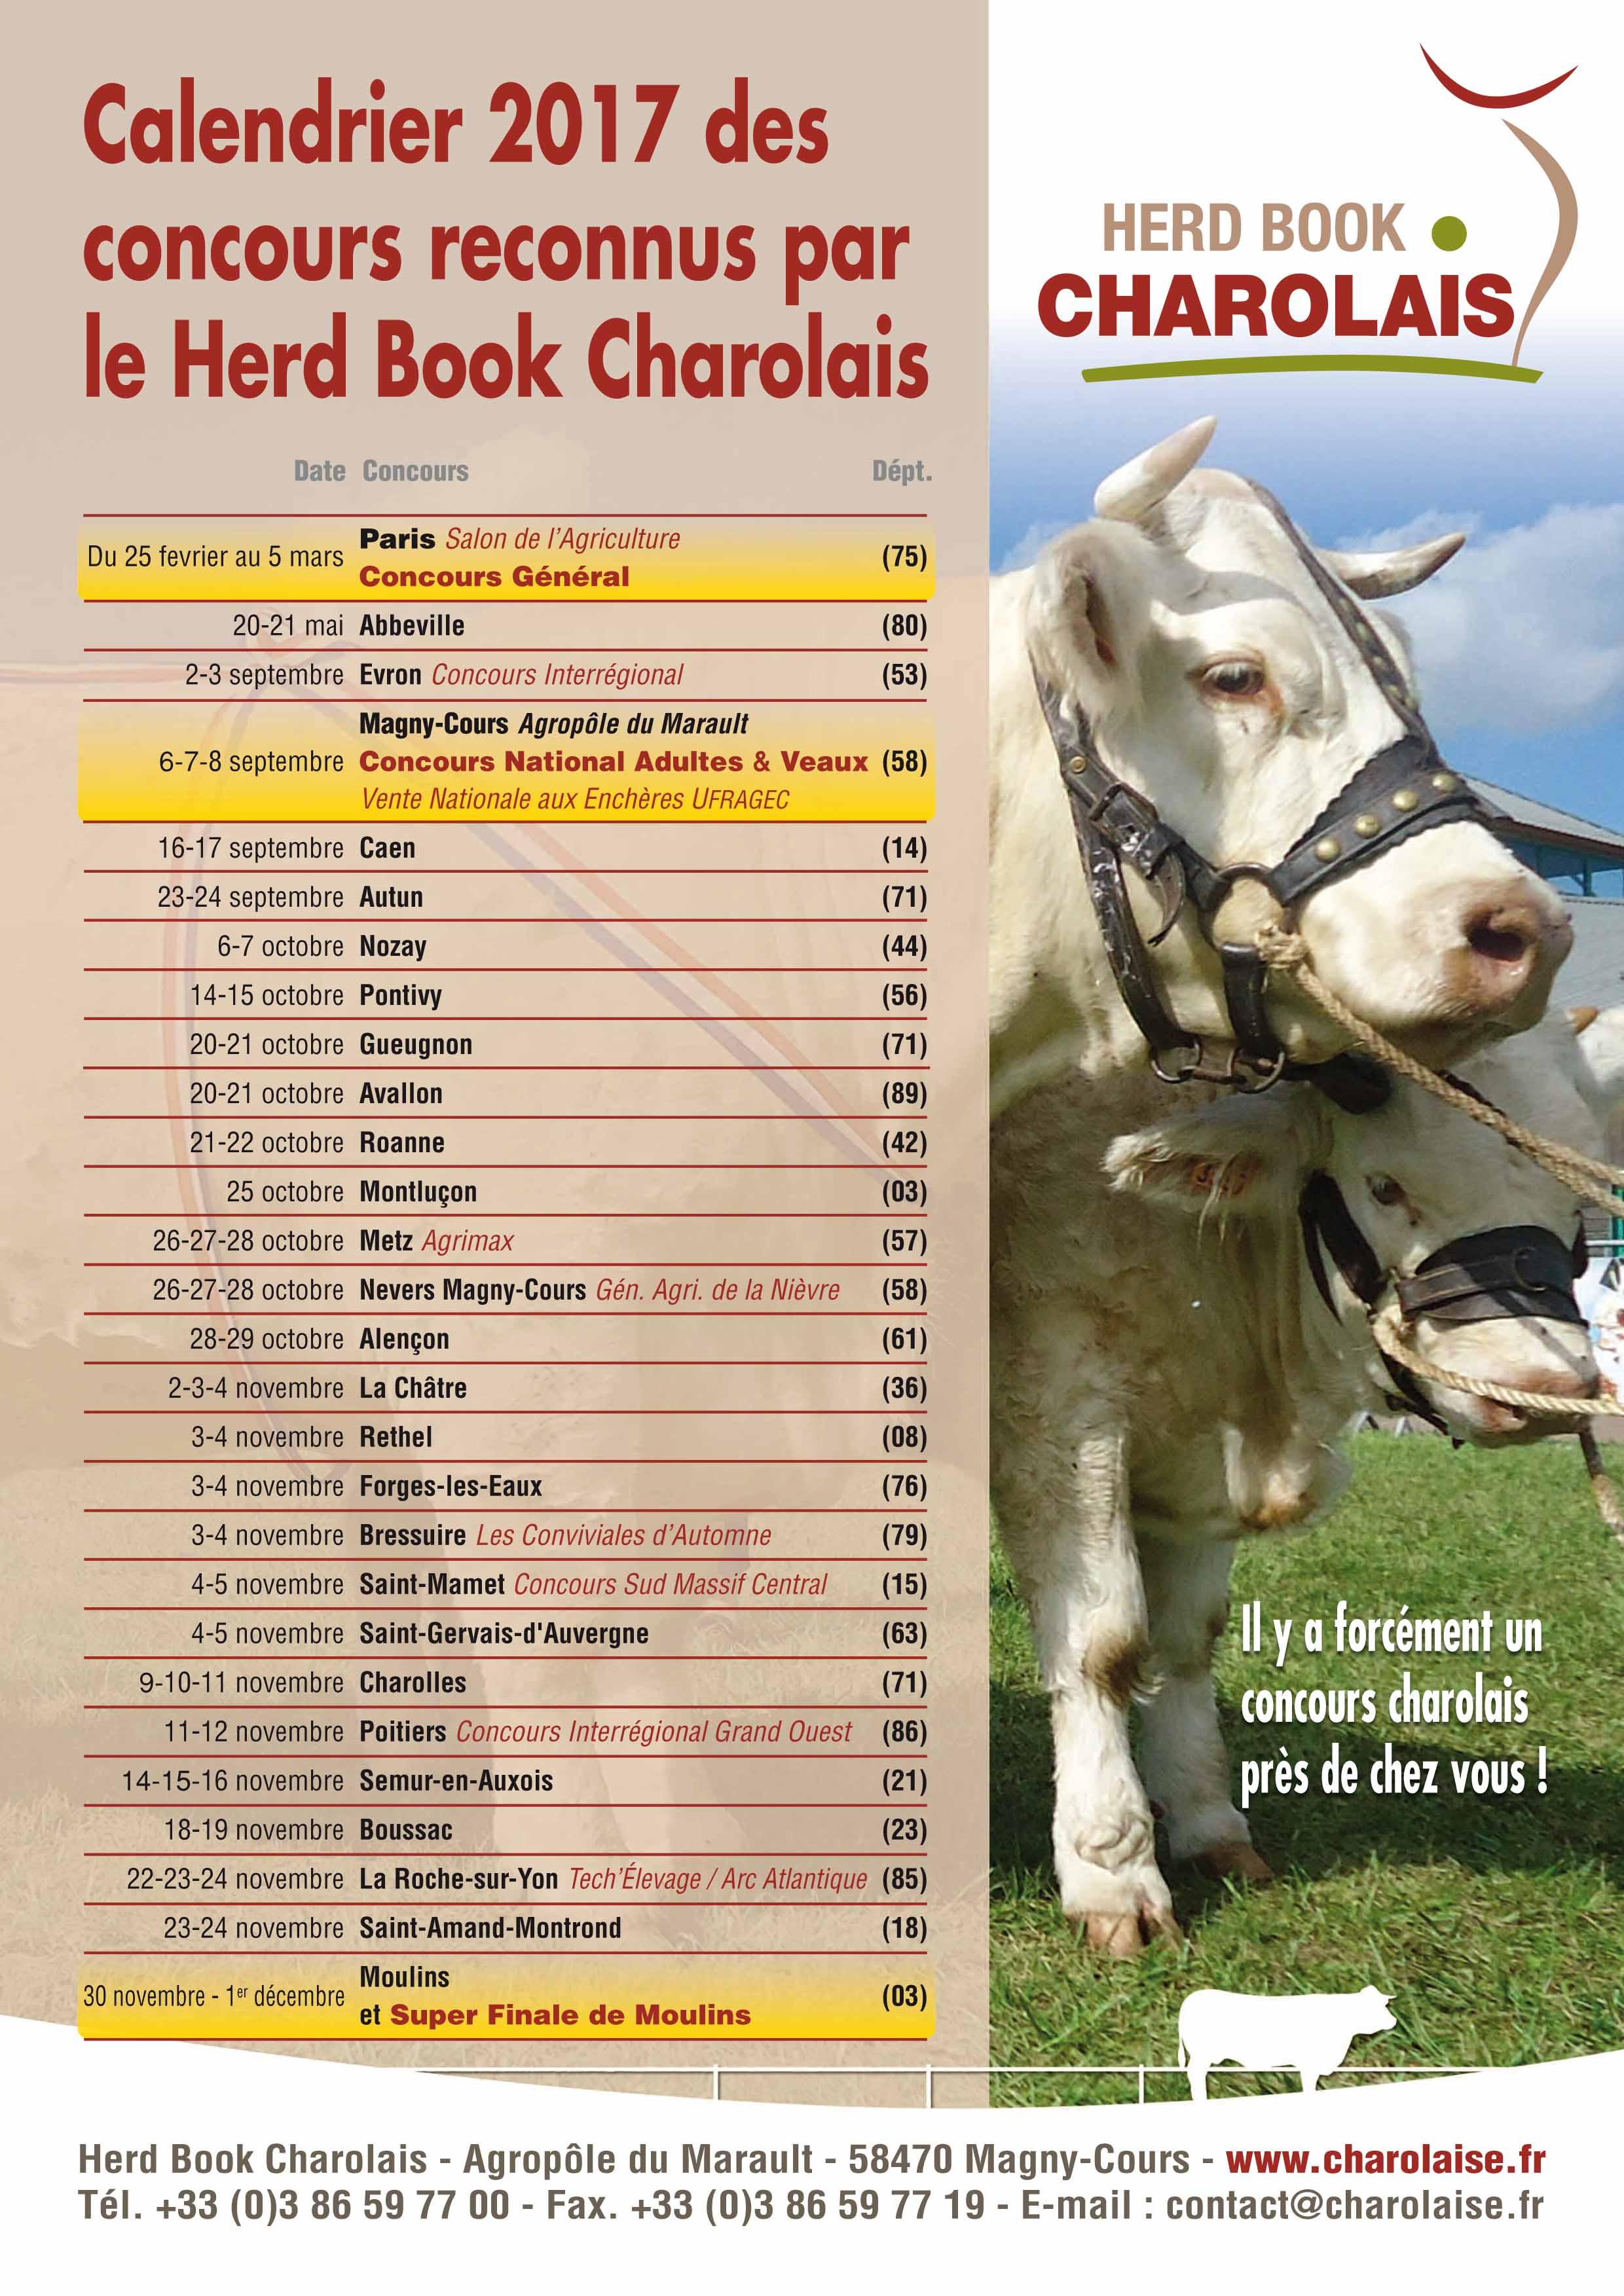 Herd book charolais boutique dresses